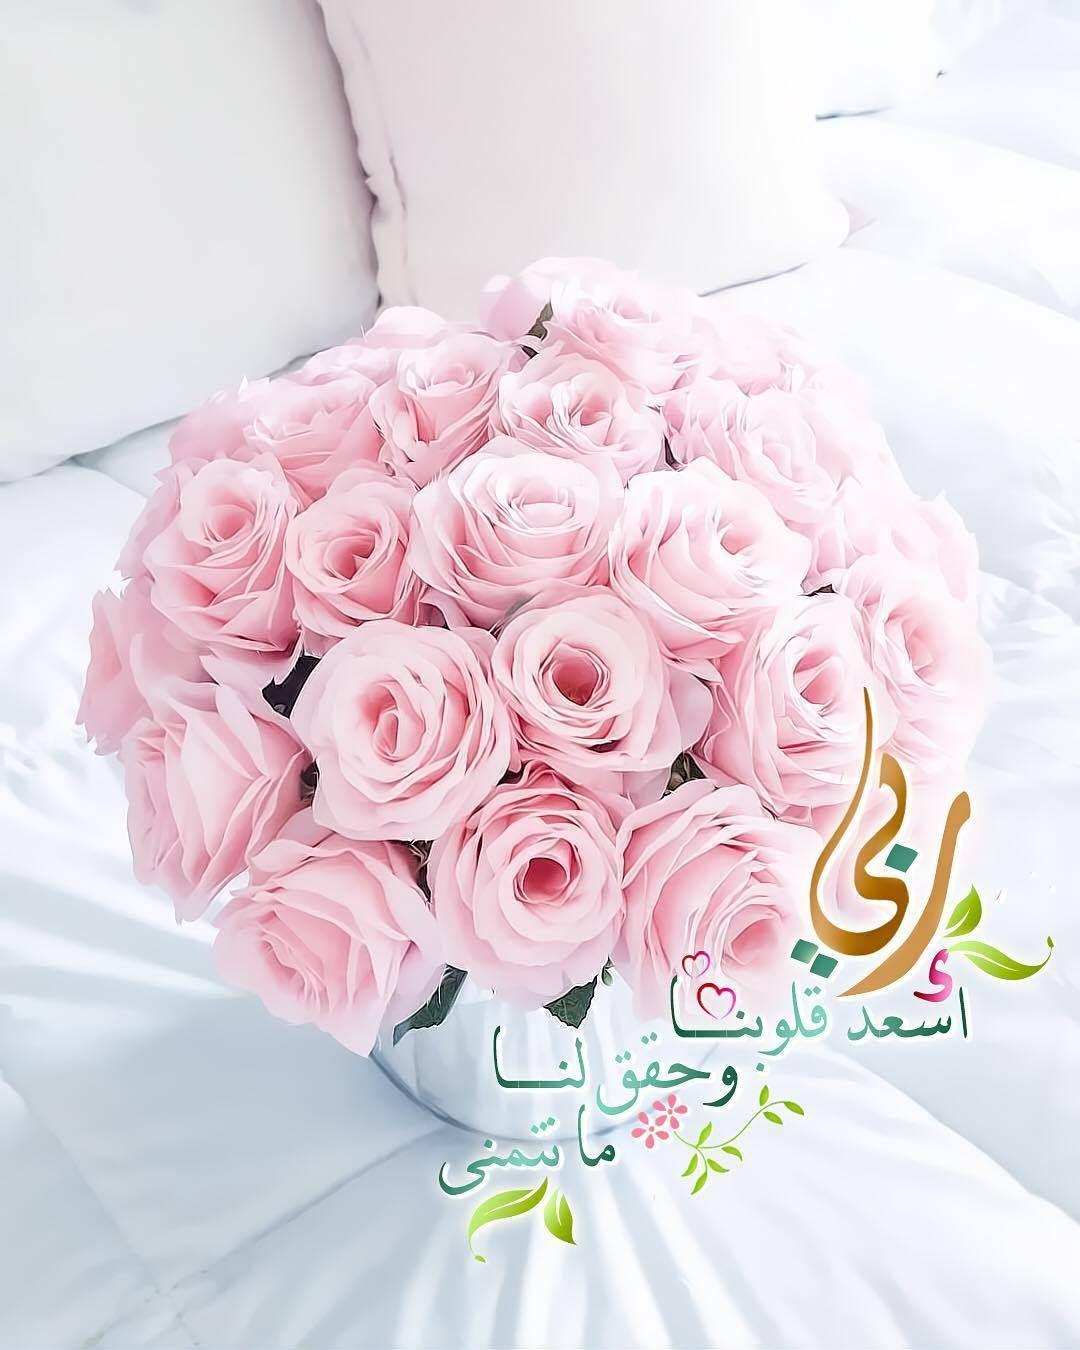 { وَبَرًّا بِوَالِدَتِي } (With images) Islamic messages